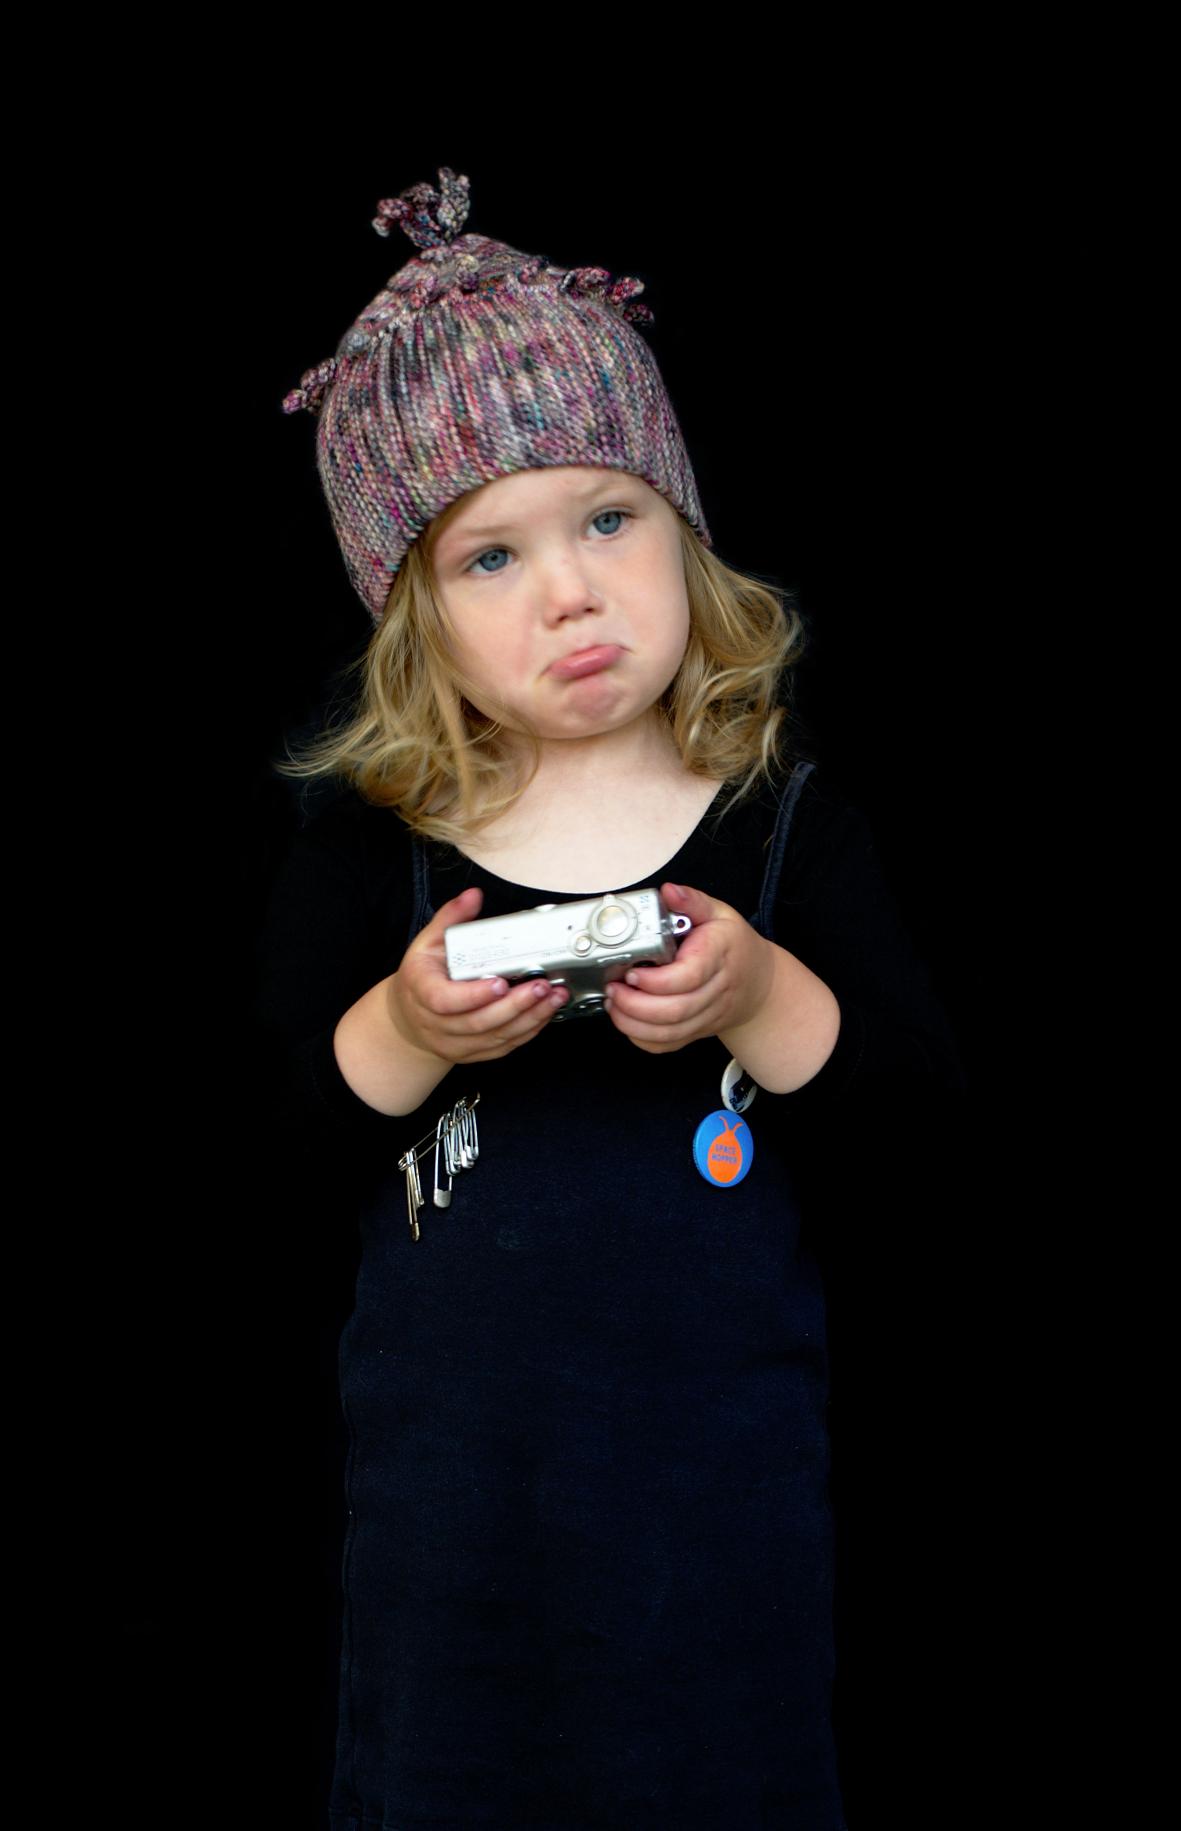 Chesser pixie Hat knitting pattern